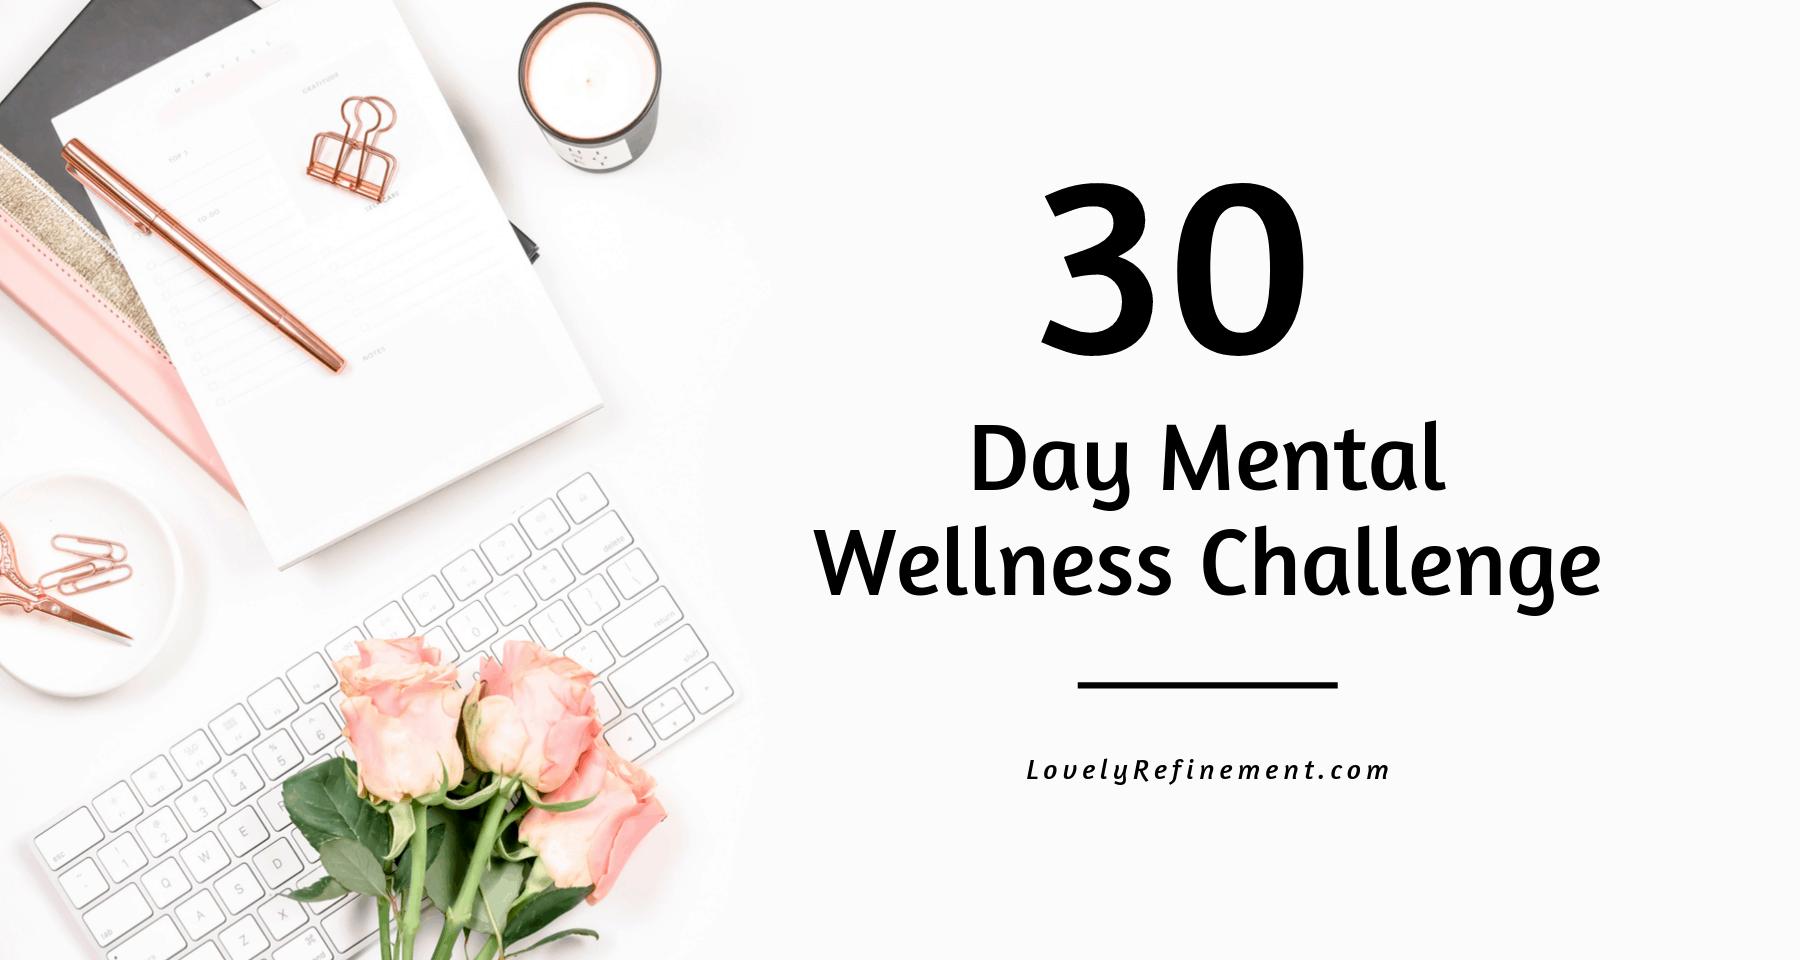 30 Day Mental Wellness Challenge